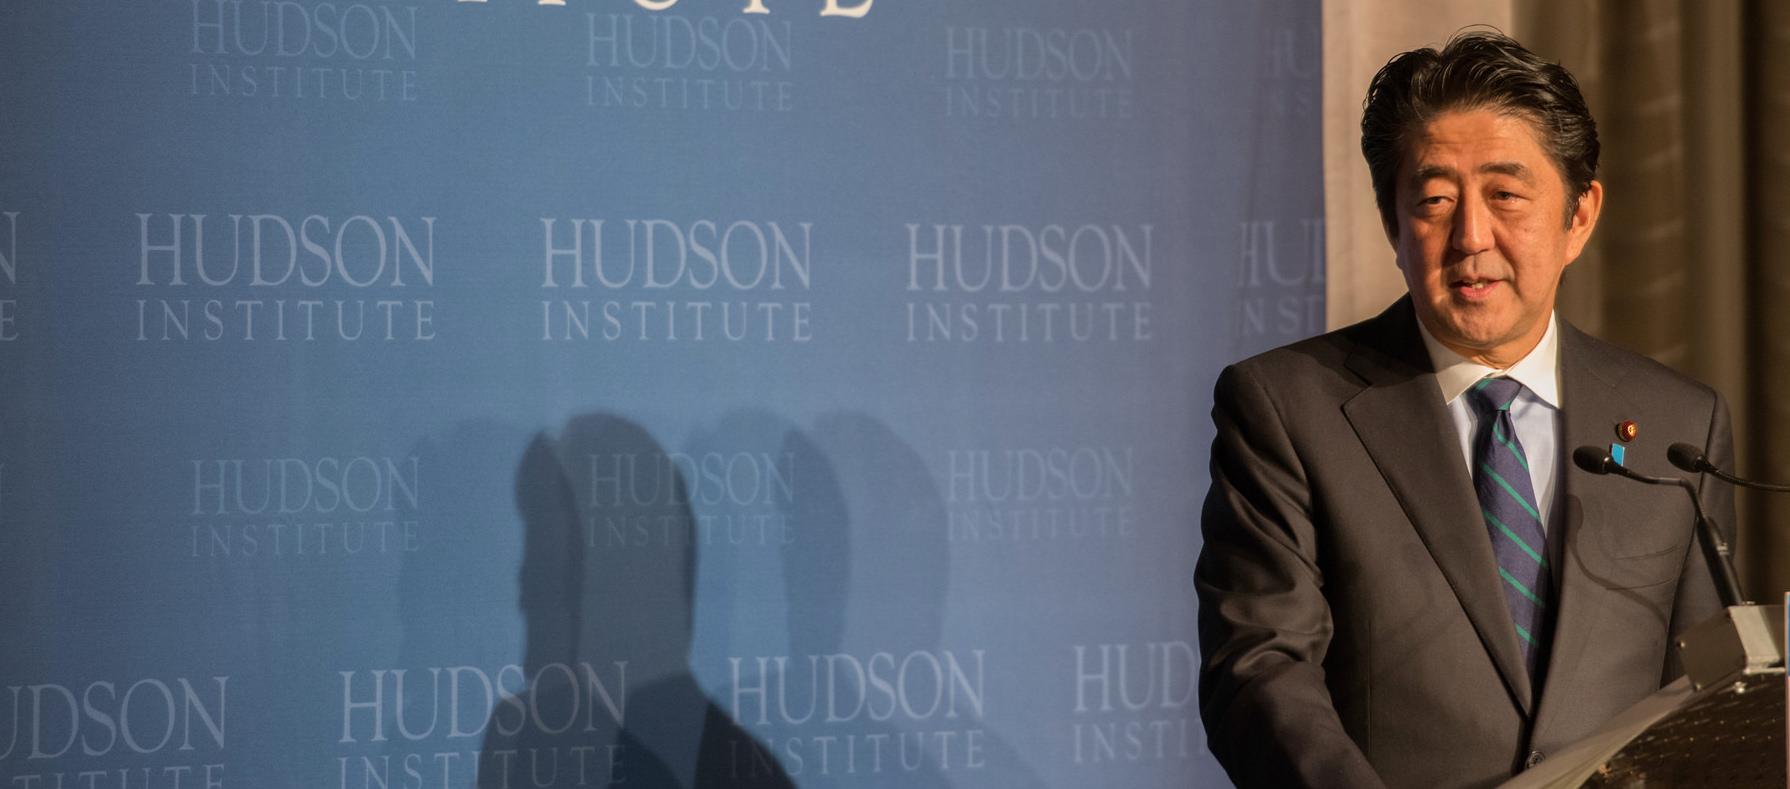 Photo: Hudson Institute/Flickr